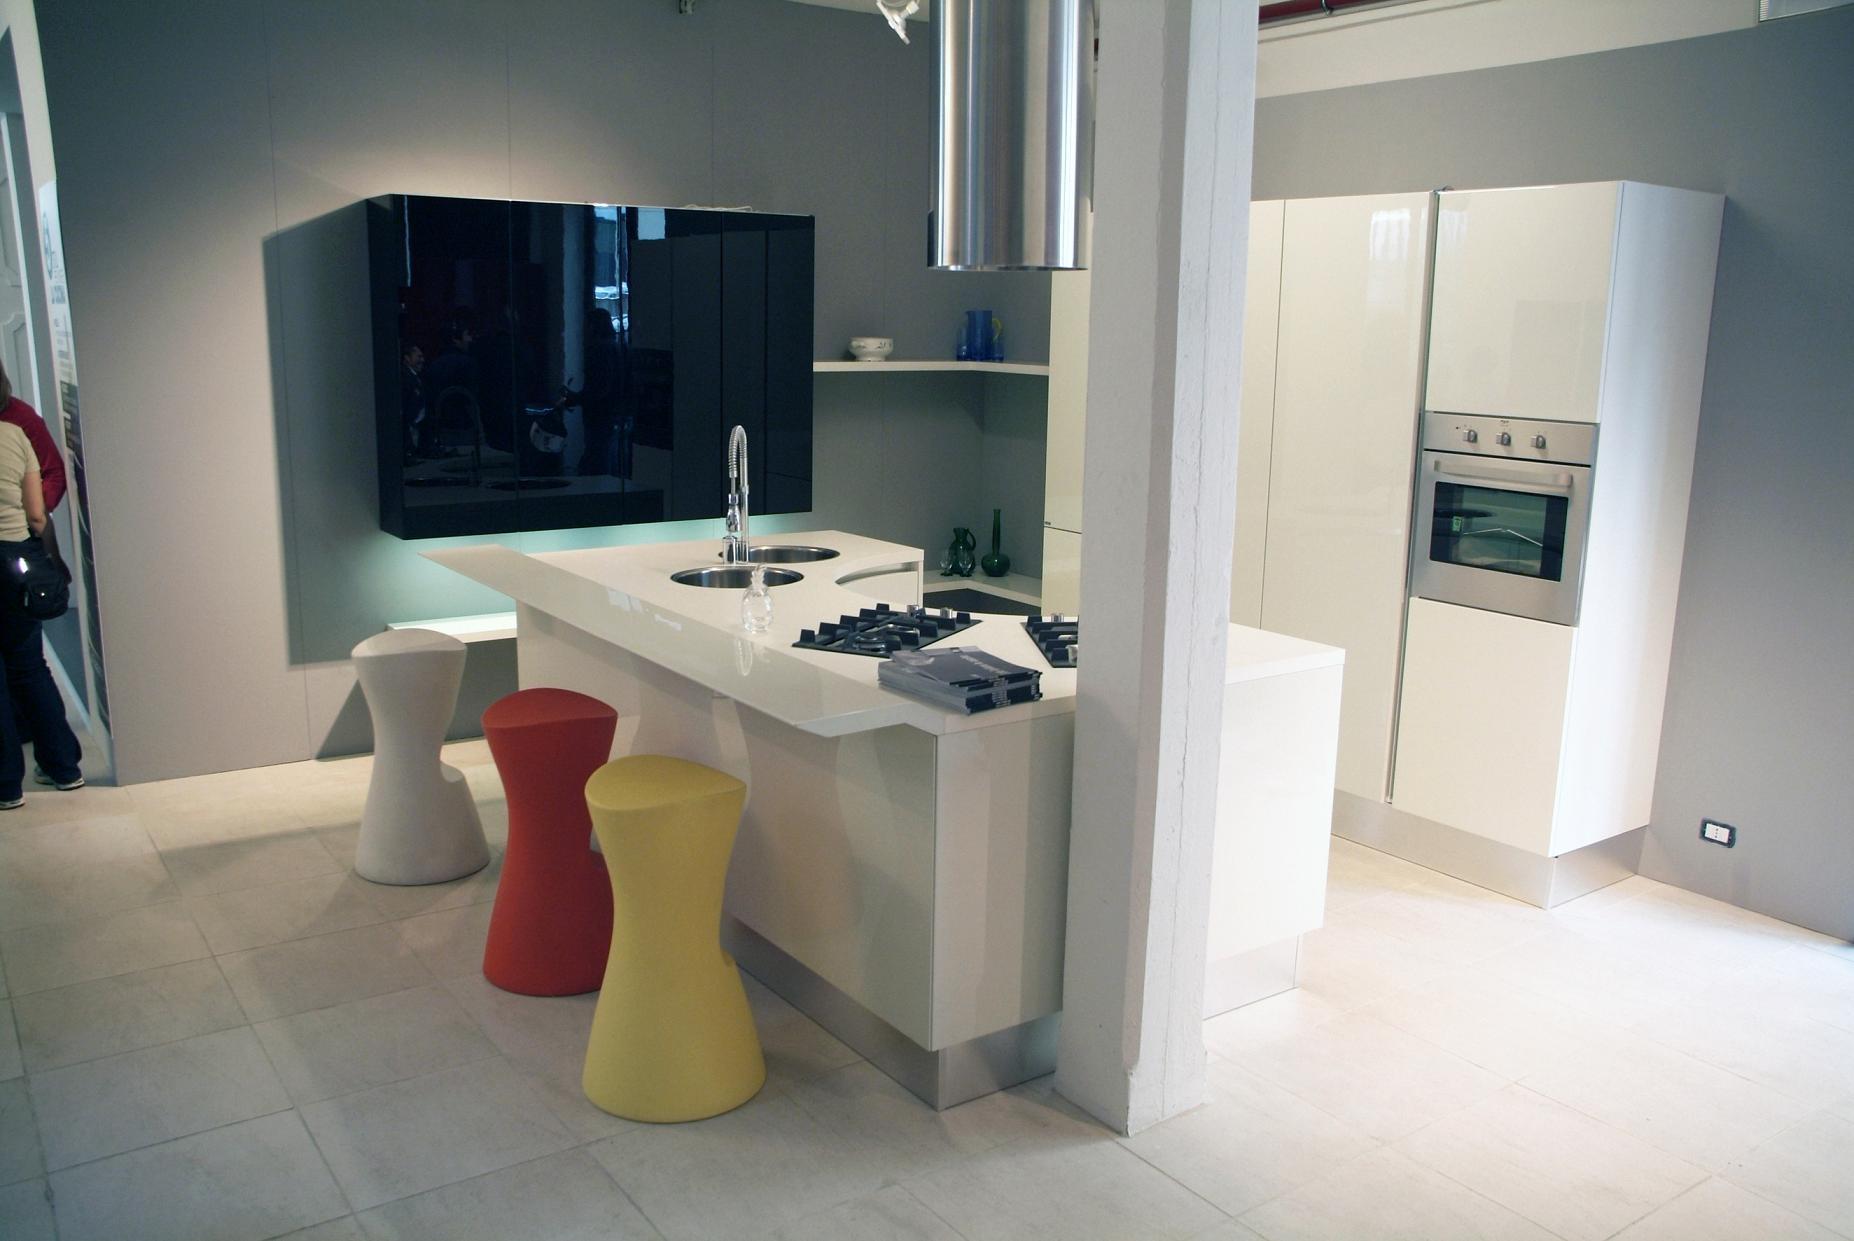 Awesome Composit Cucine Prezzi Photos - Ideas & Design 2017 ...